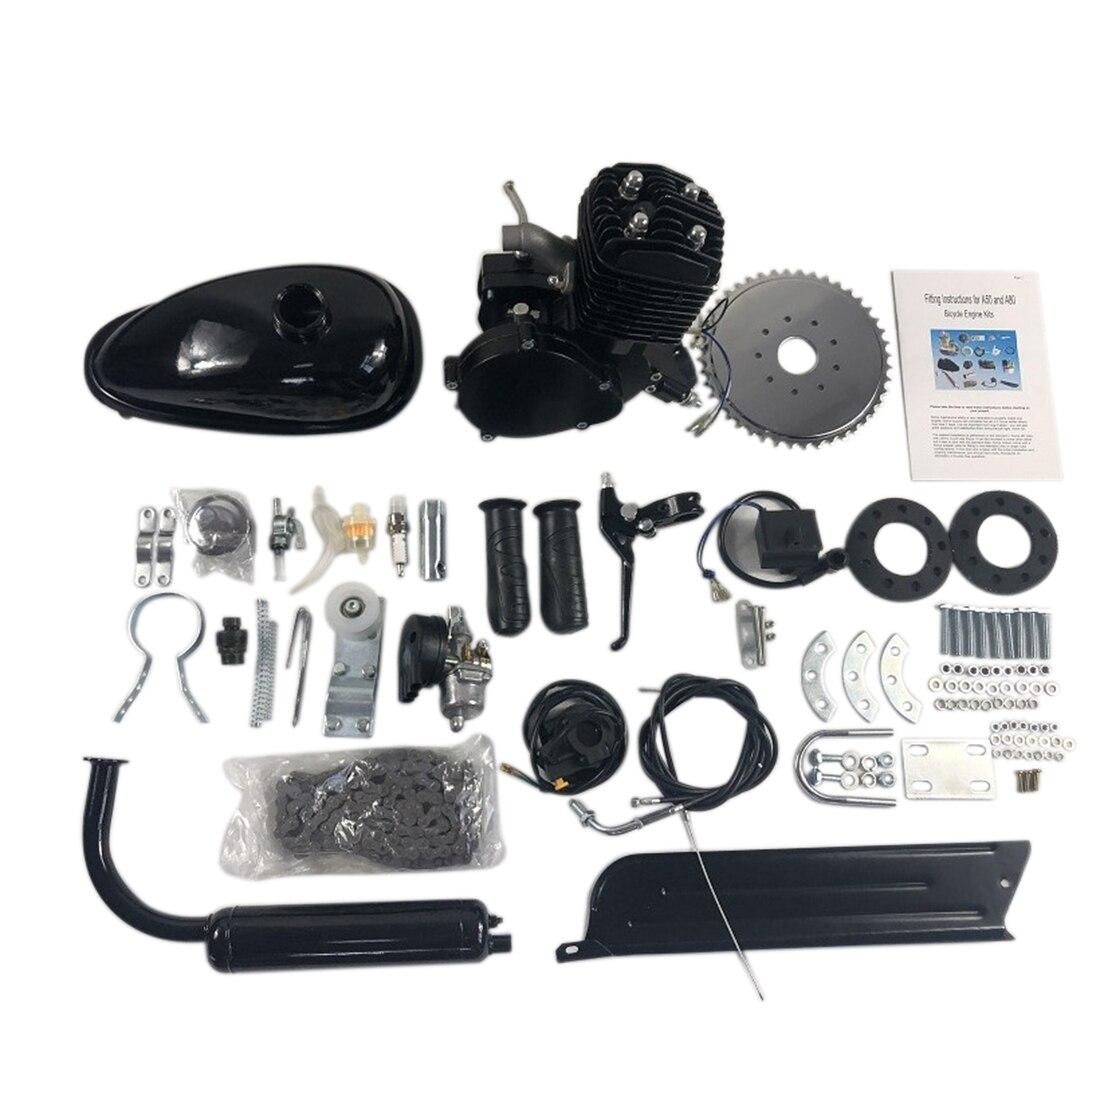 50CC 2 Stroke Petrol Gas Engine Kit Bicycle Modified Engine Set - Black